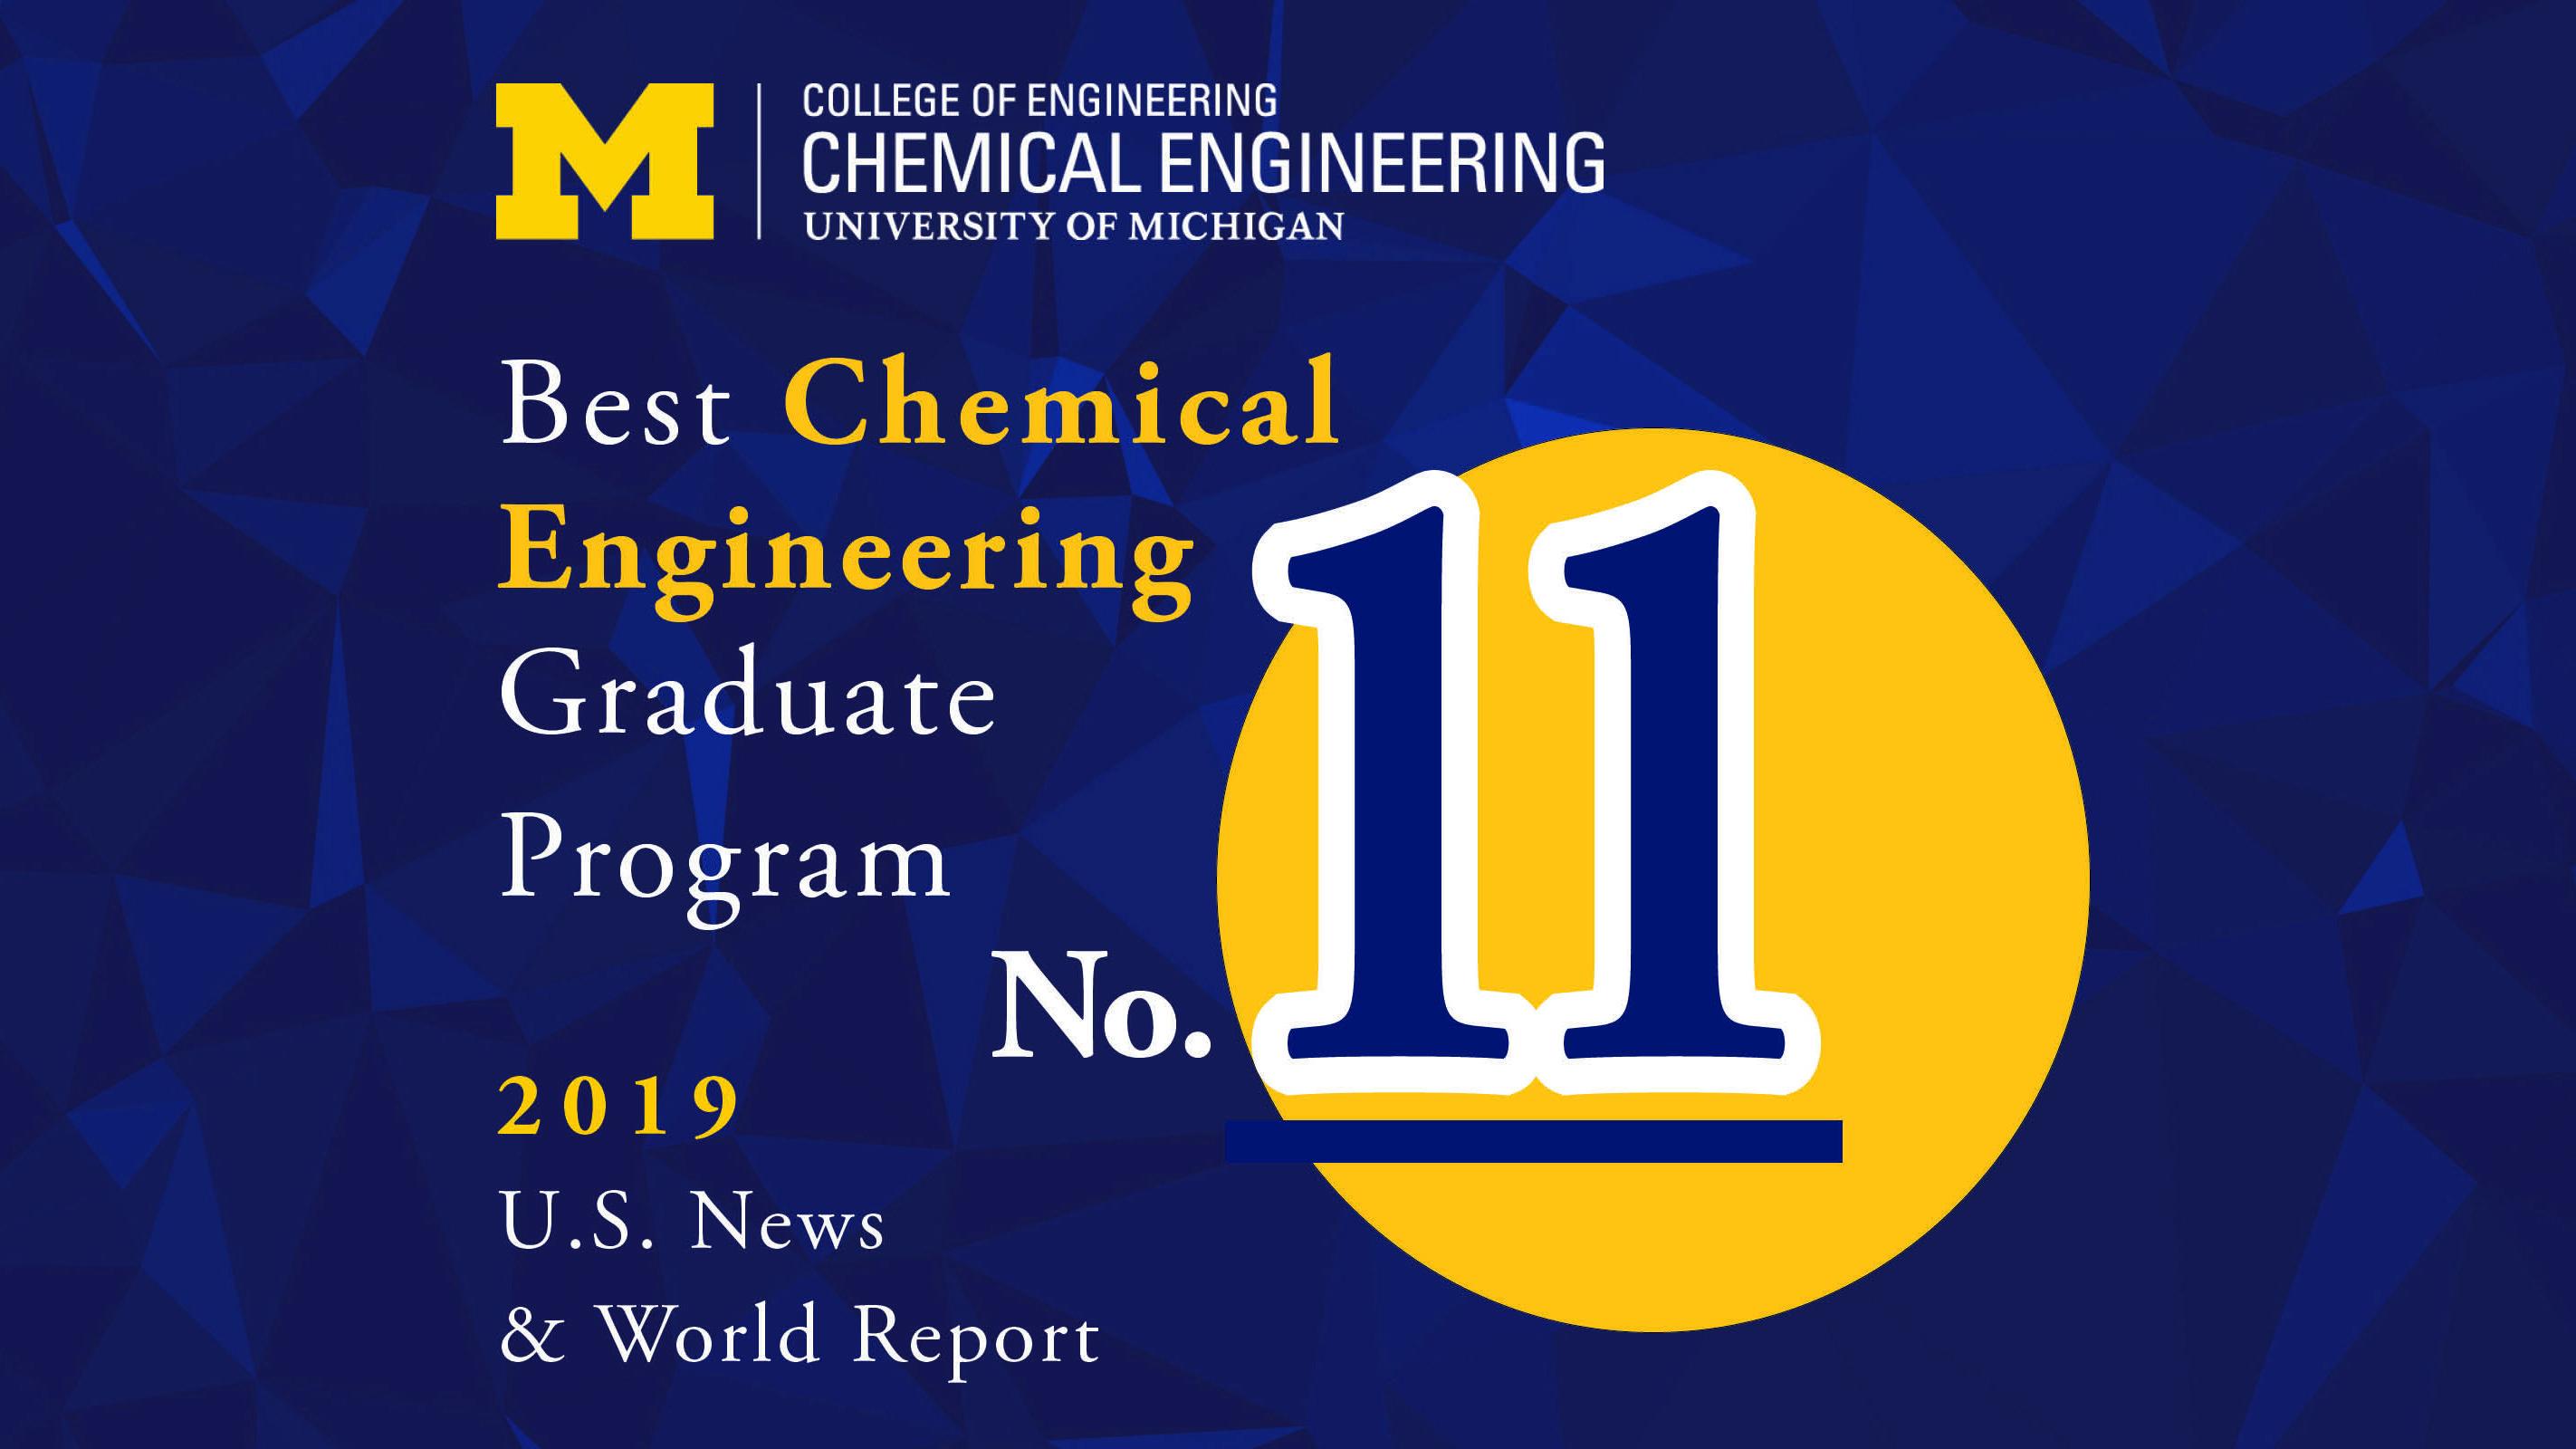 ChE rises in U.S. News & World Report graduate program rankings